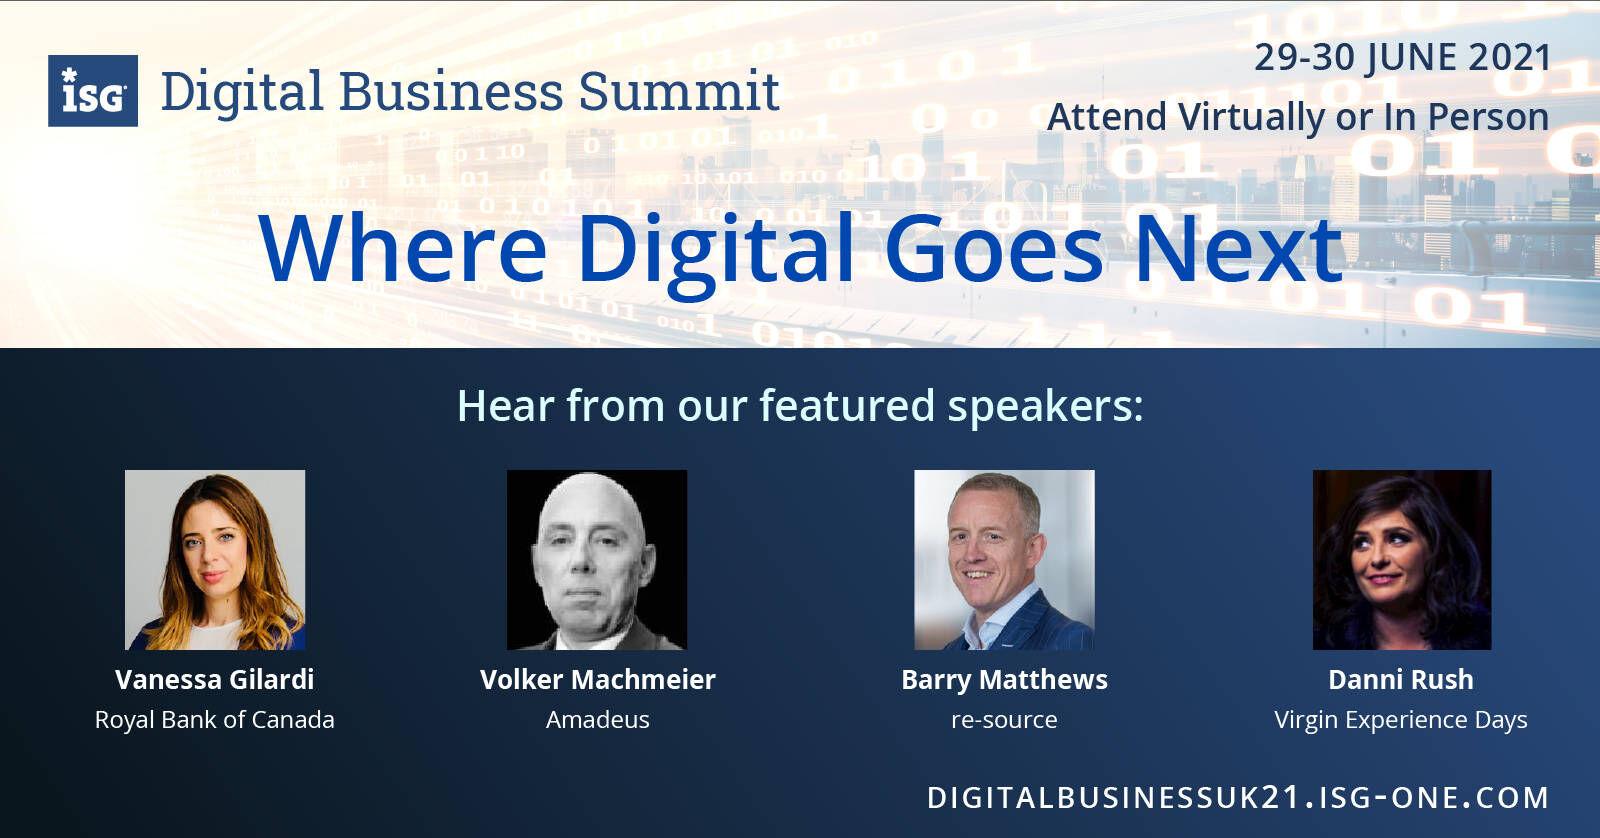 Digital-Business-Summit-UK-2021-social